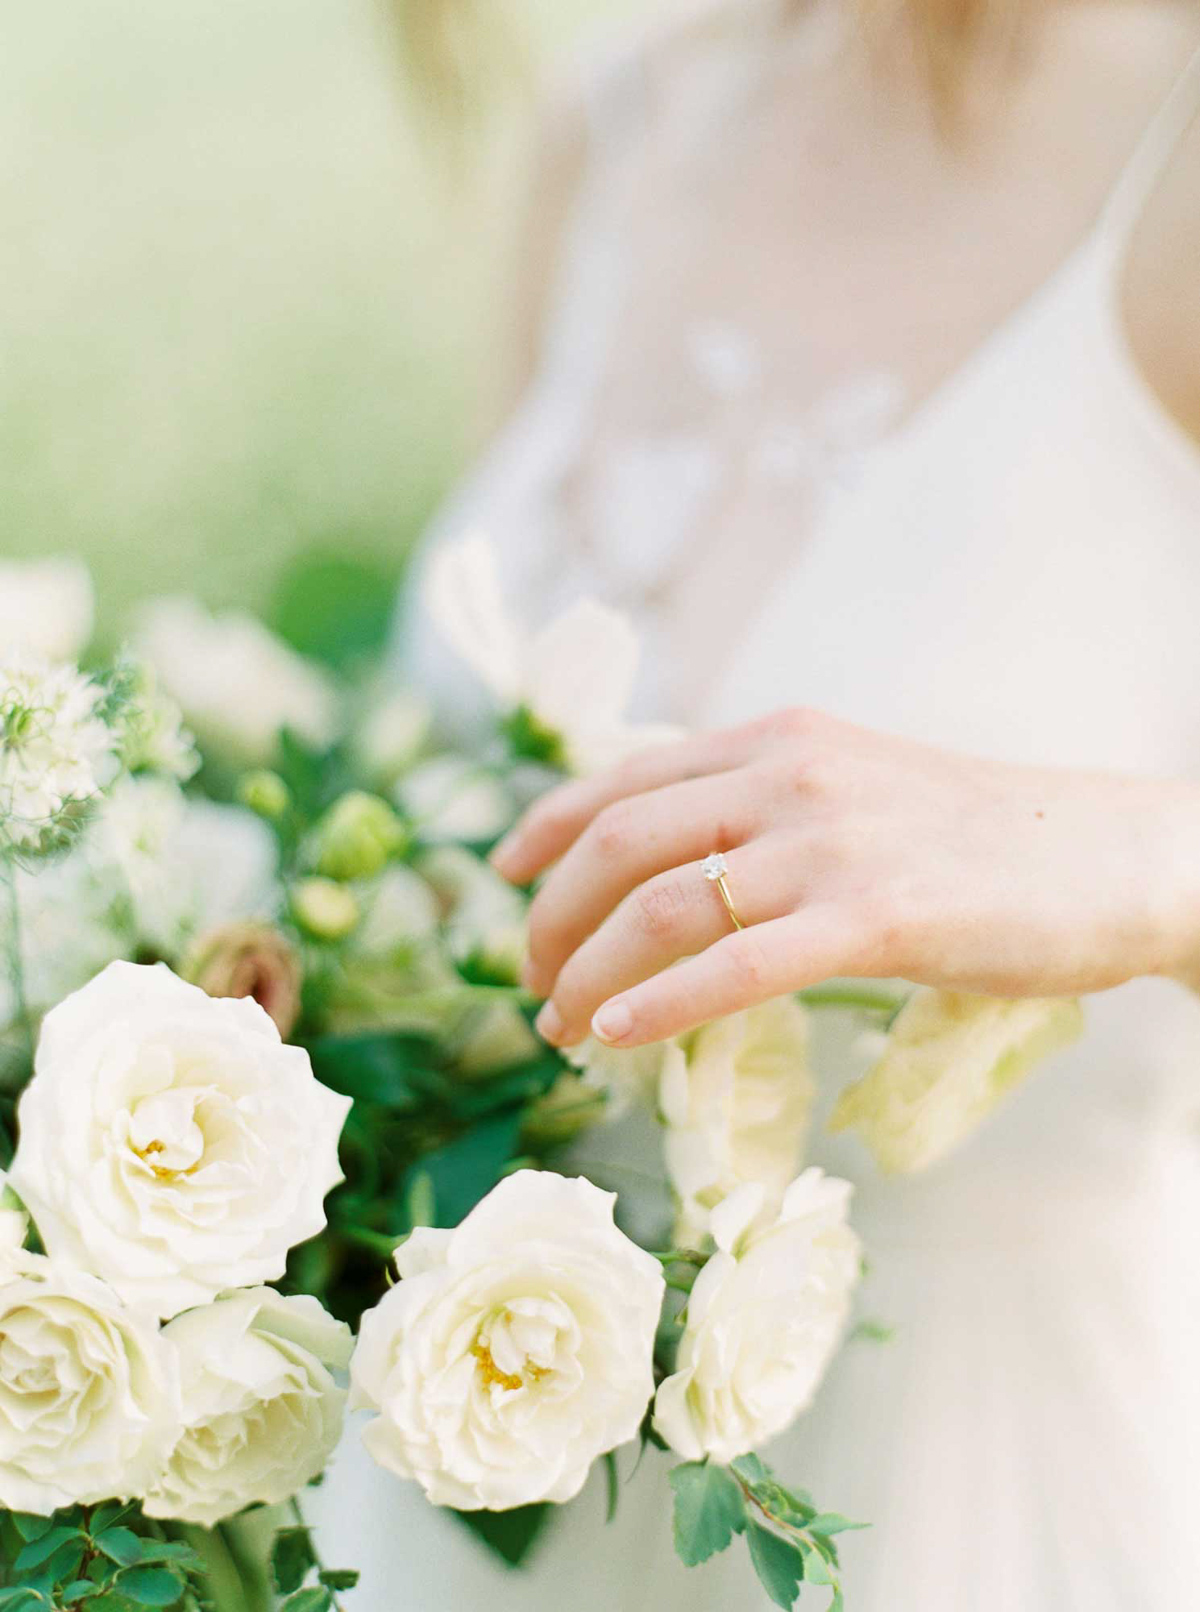 kayla-yestal-vineyard-bride-swish-list-woodland-weddings-niagara-wedding-editorial-33.jpg